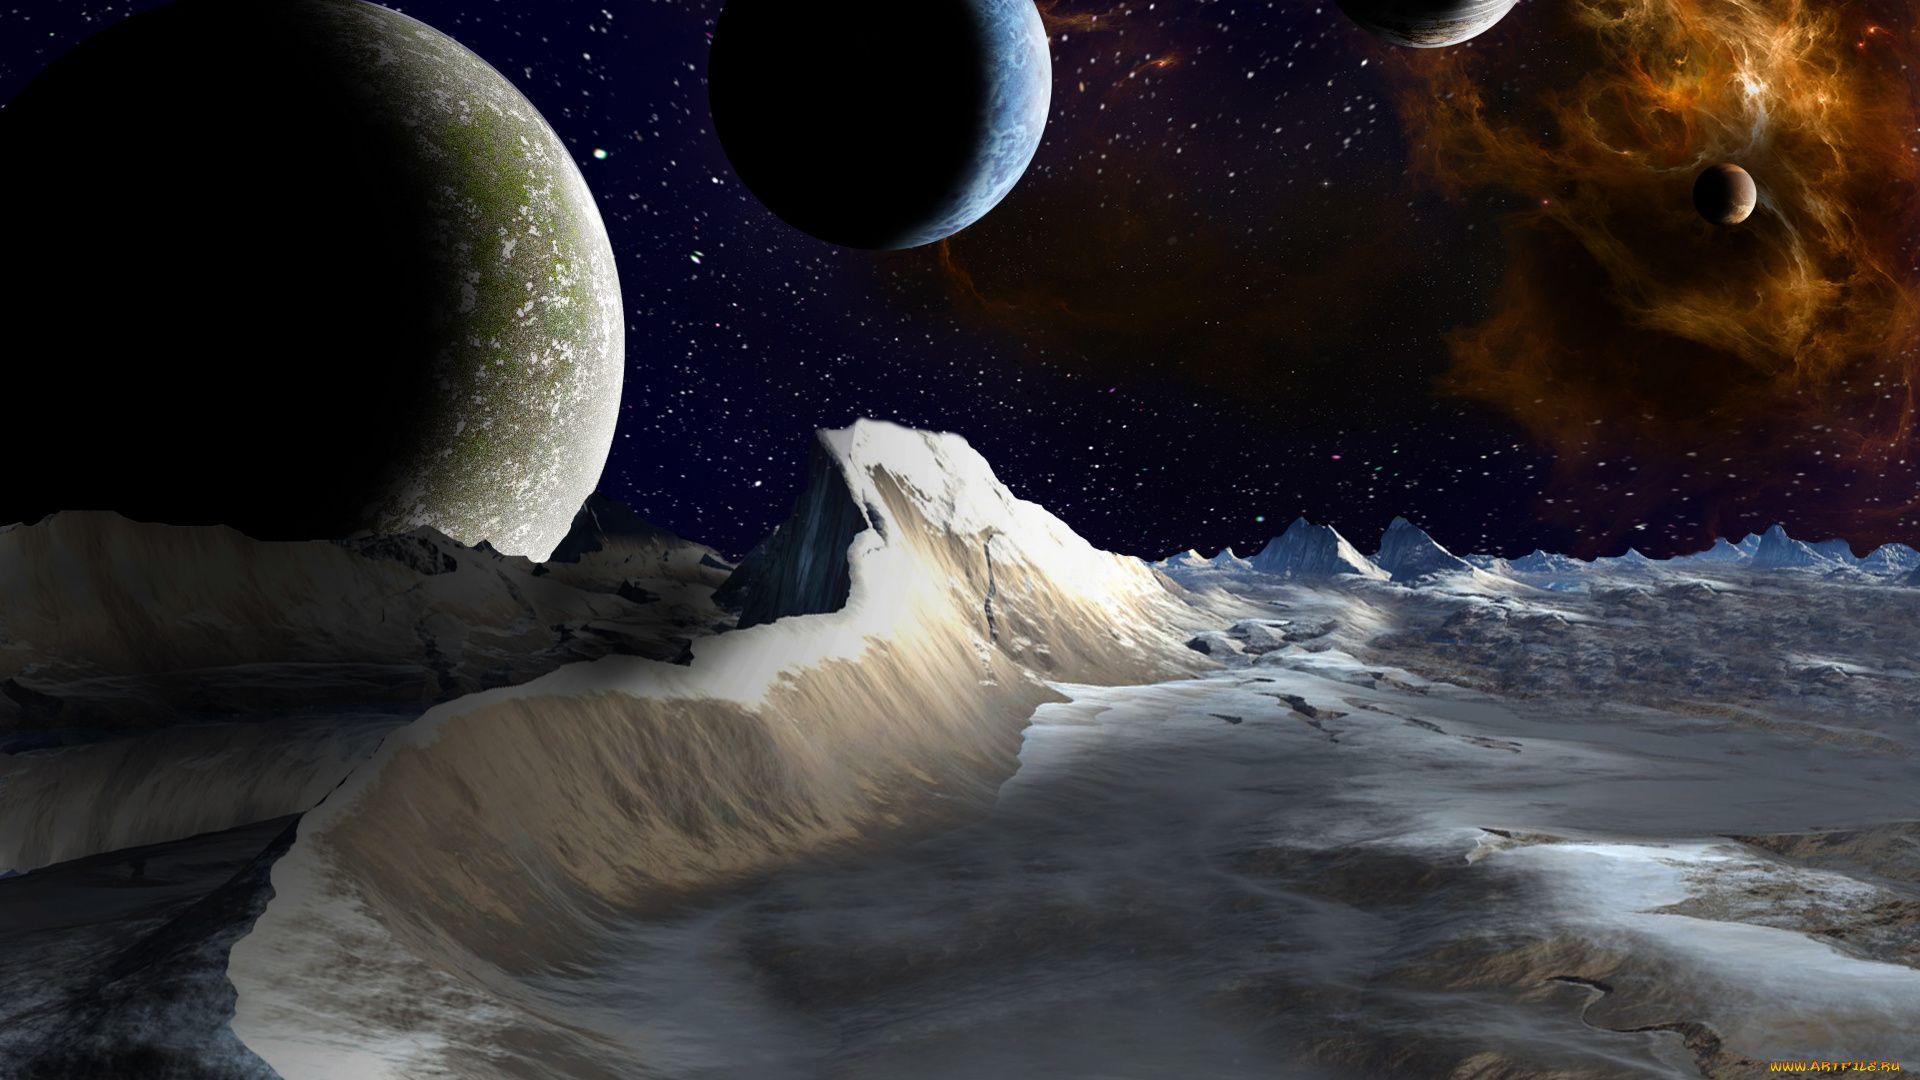 Space Themed full hd wallpaper